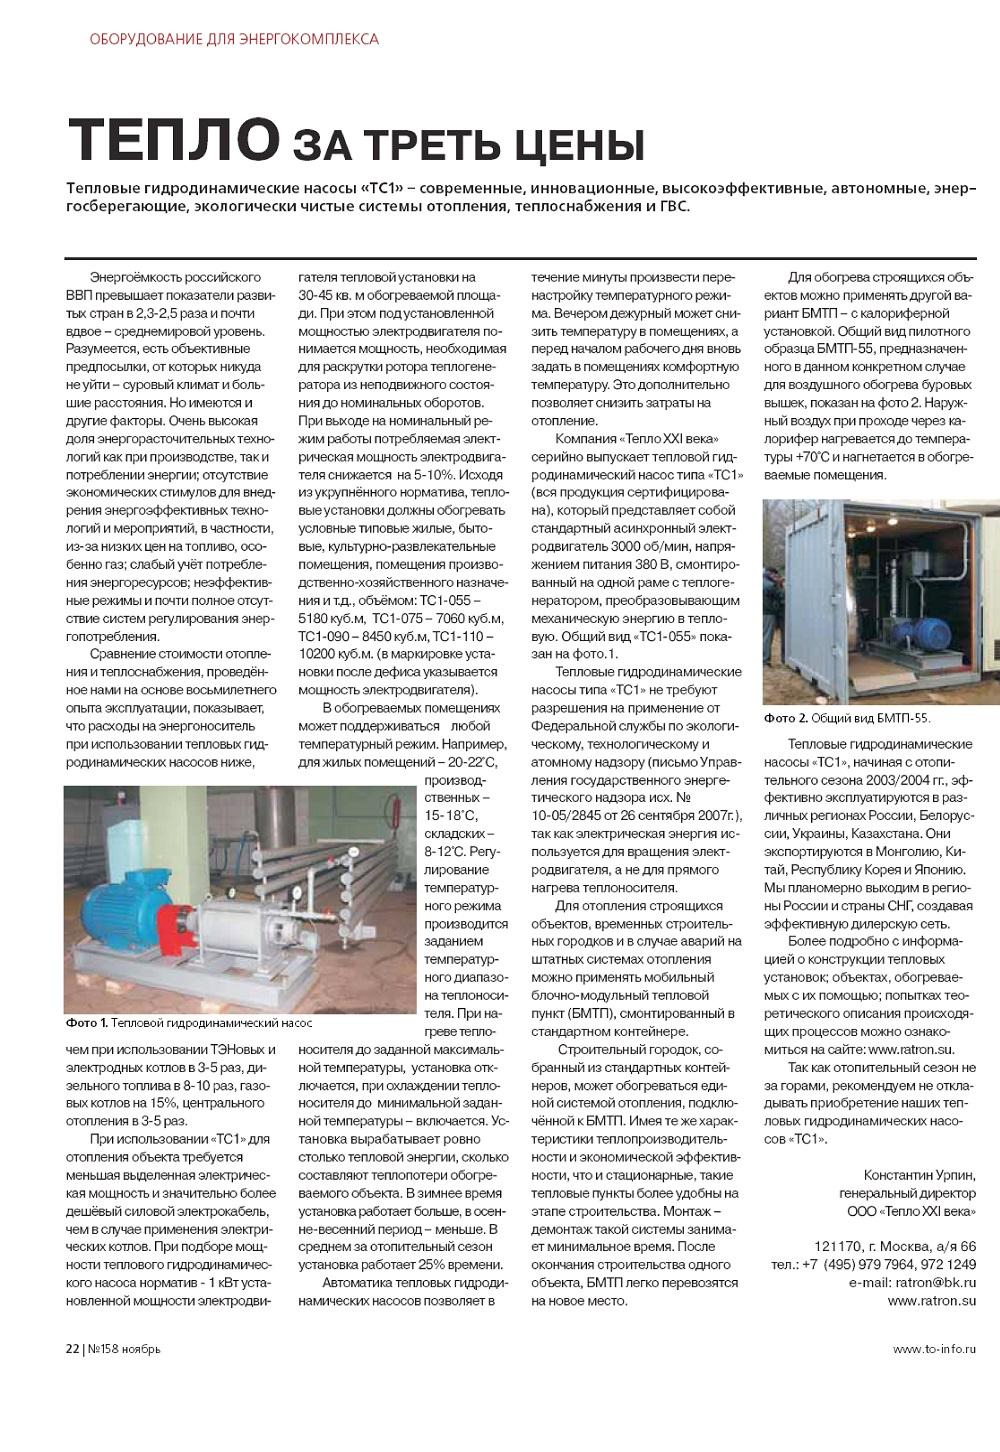 журнал теплоэнергетика архив №9 2008